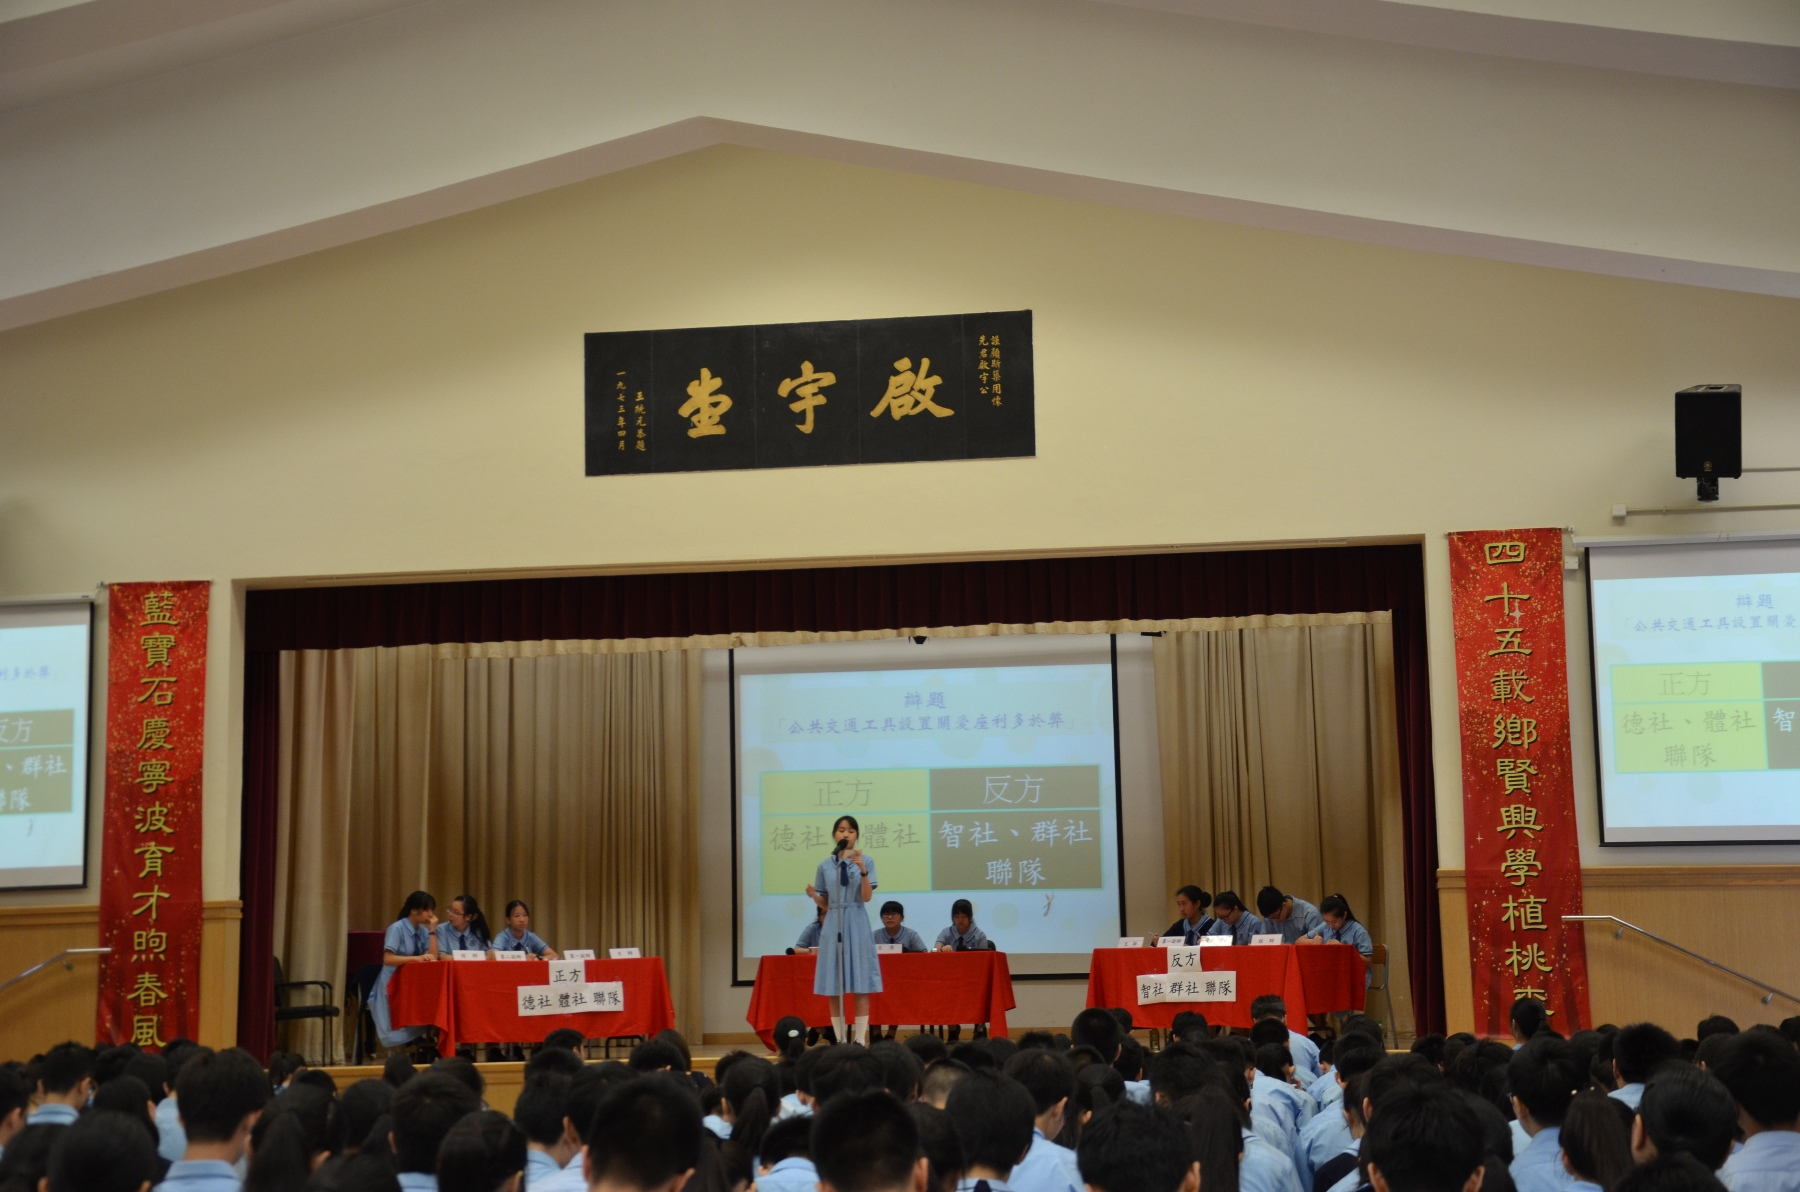 http://www.npc.edu.hk/sites/default/files/dsc_6778.jpg